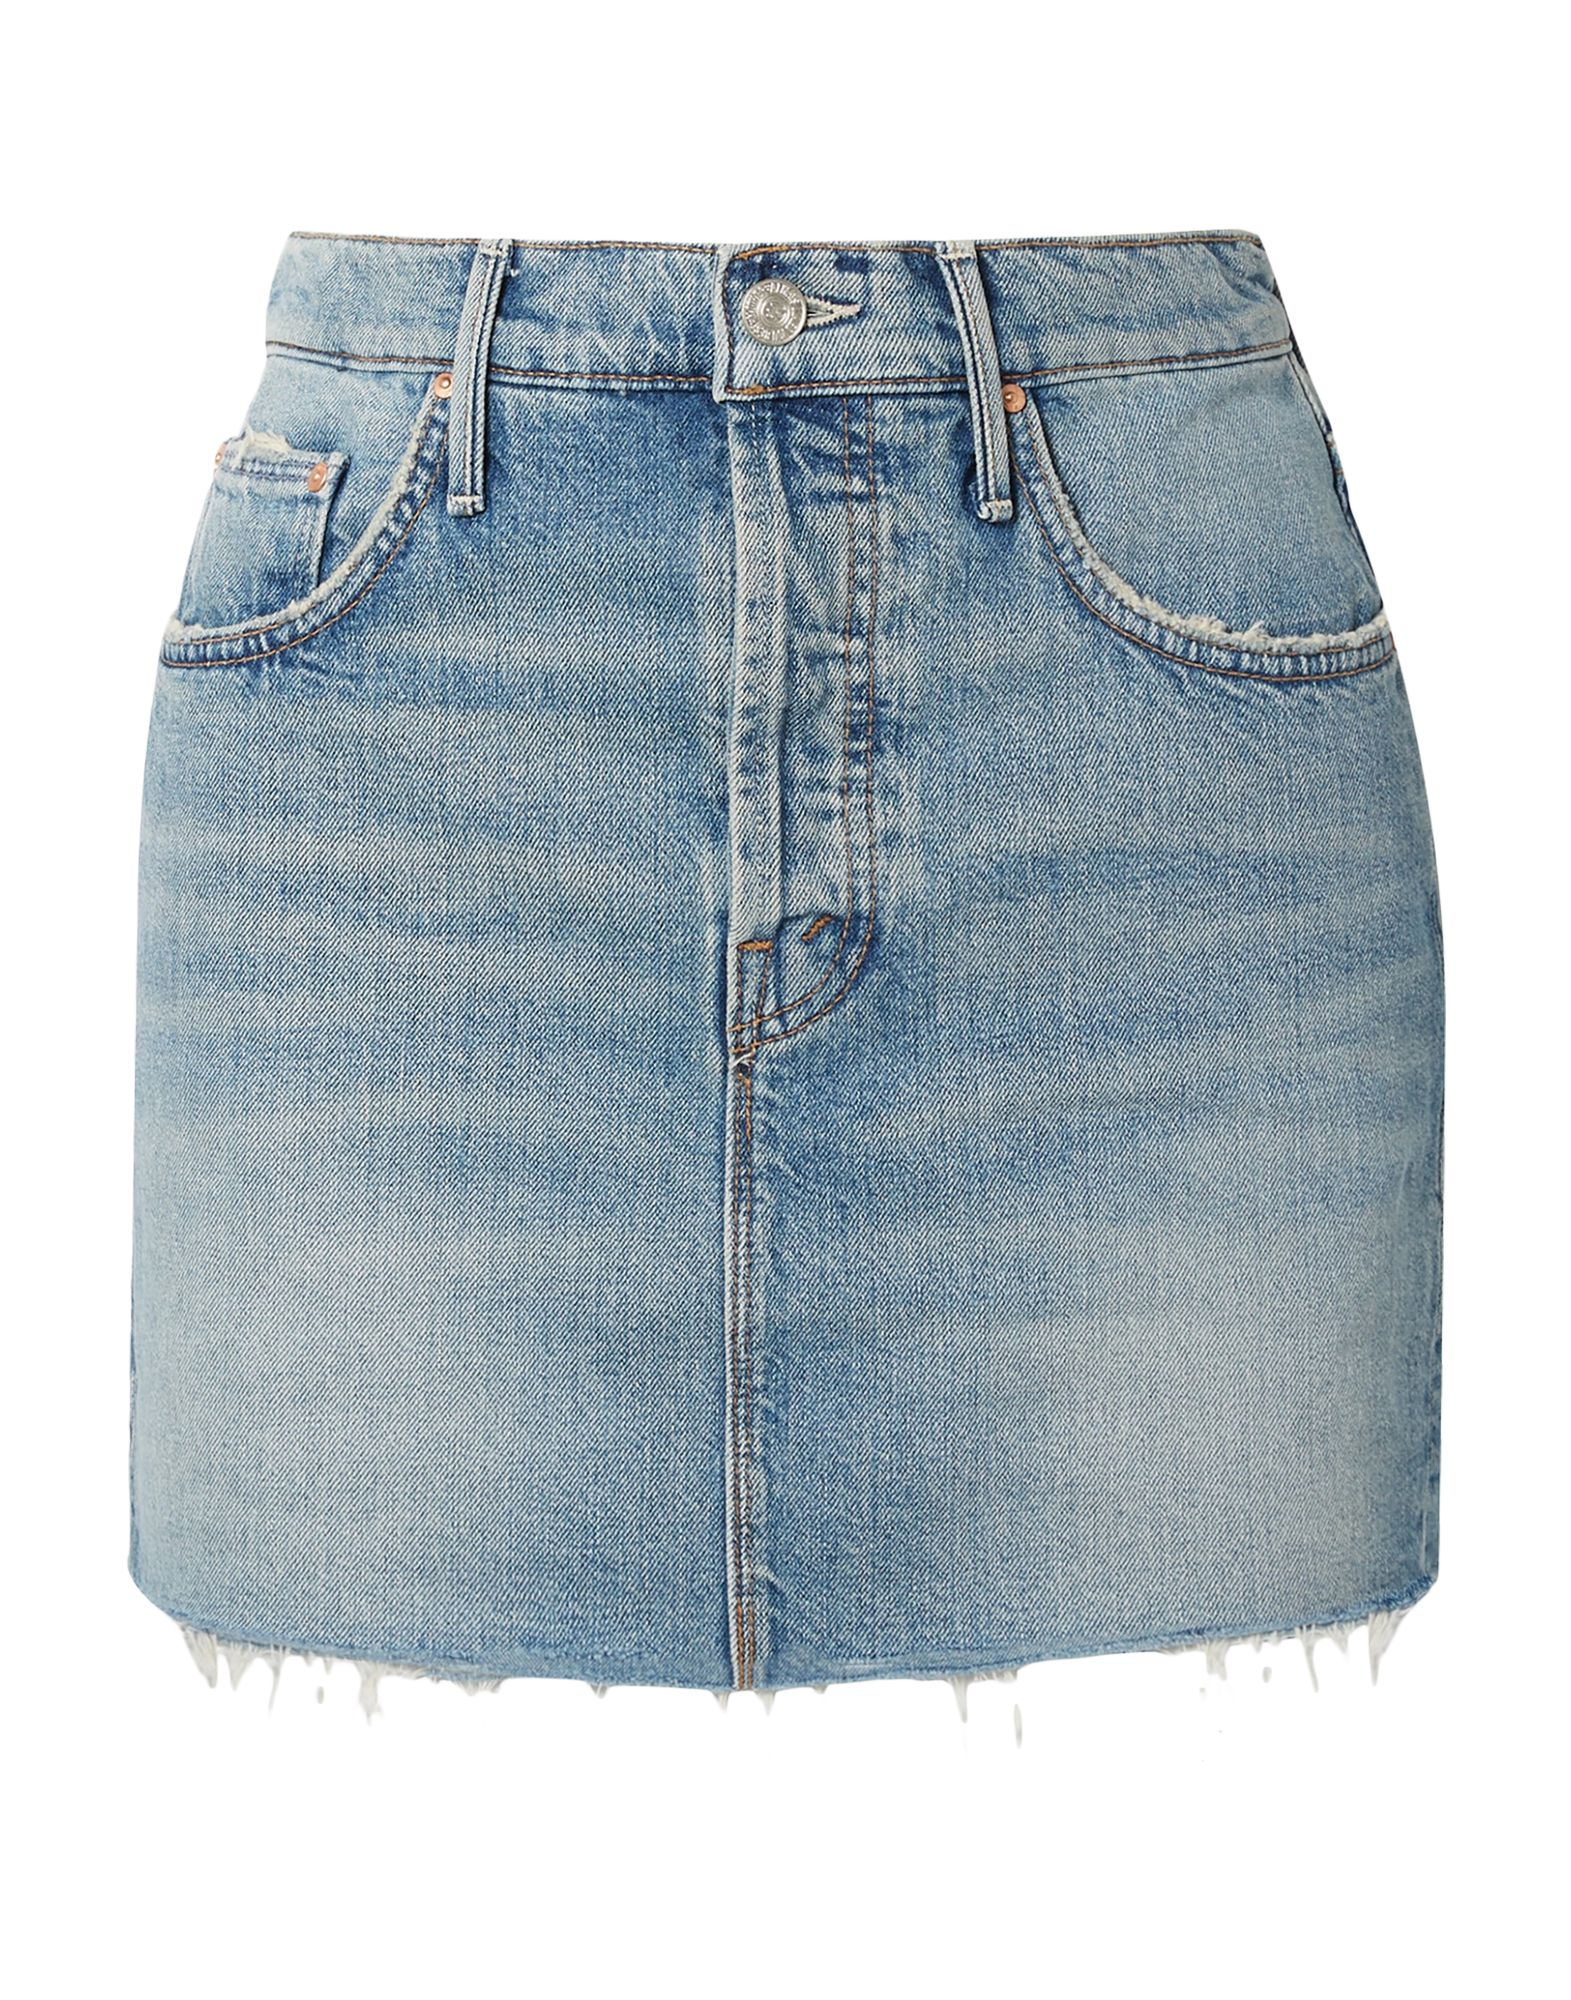 2nd day джинсовая юбка MOTHER Джинсовая юбка